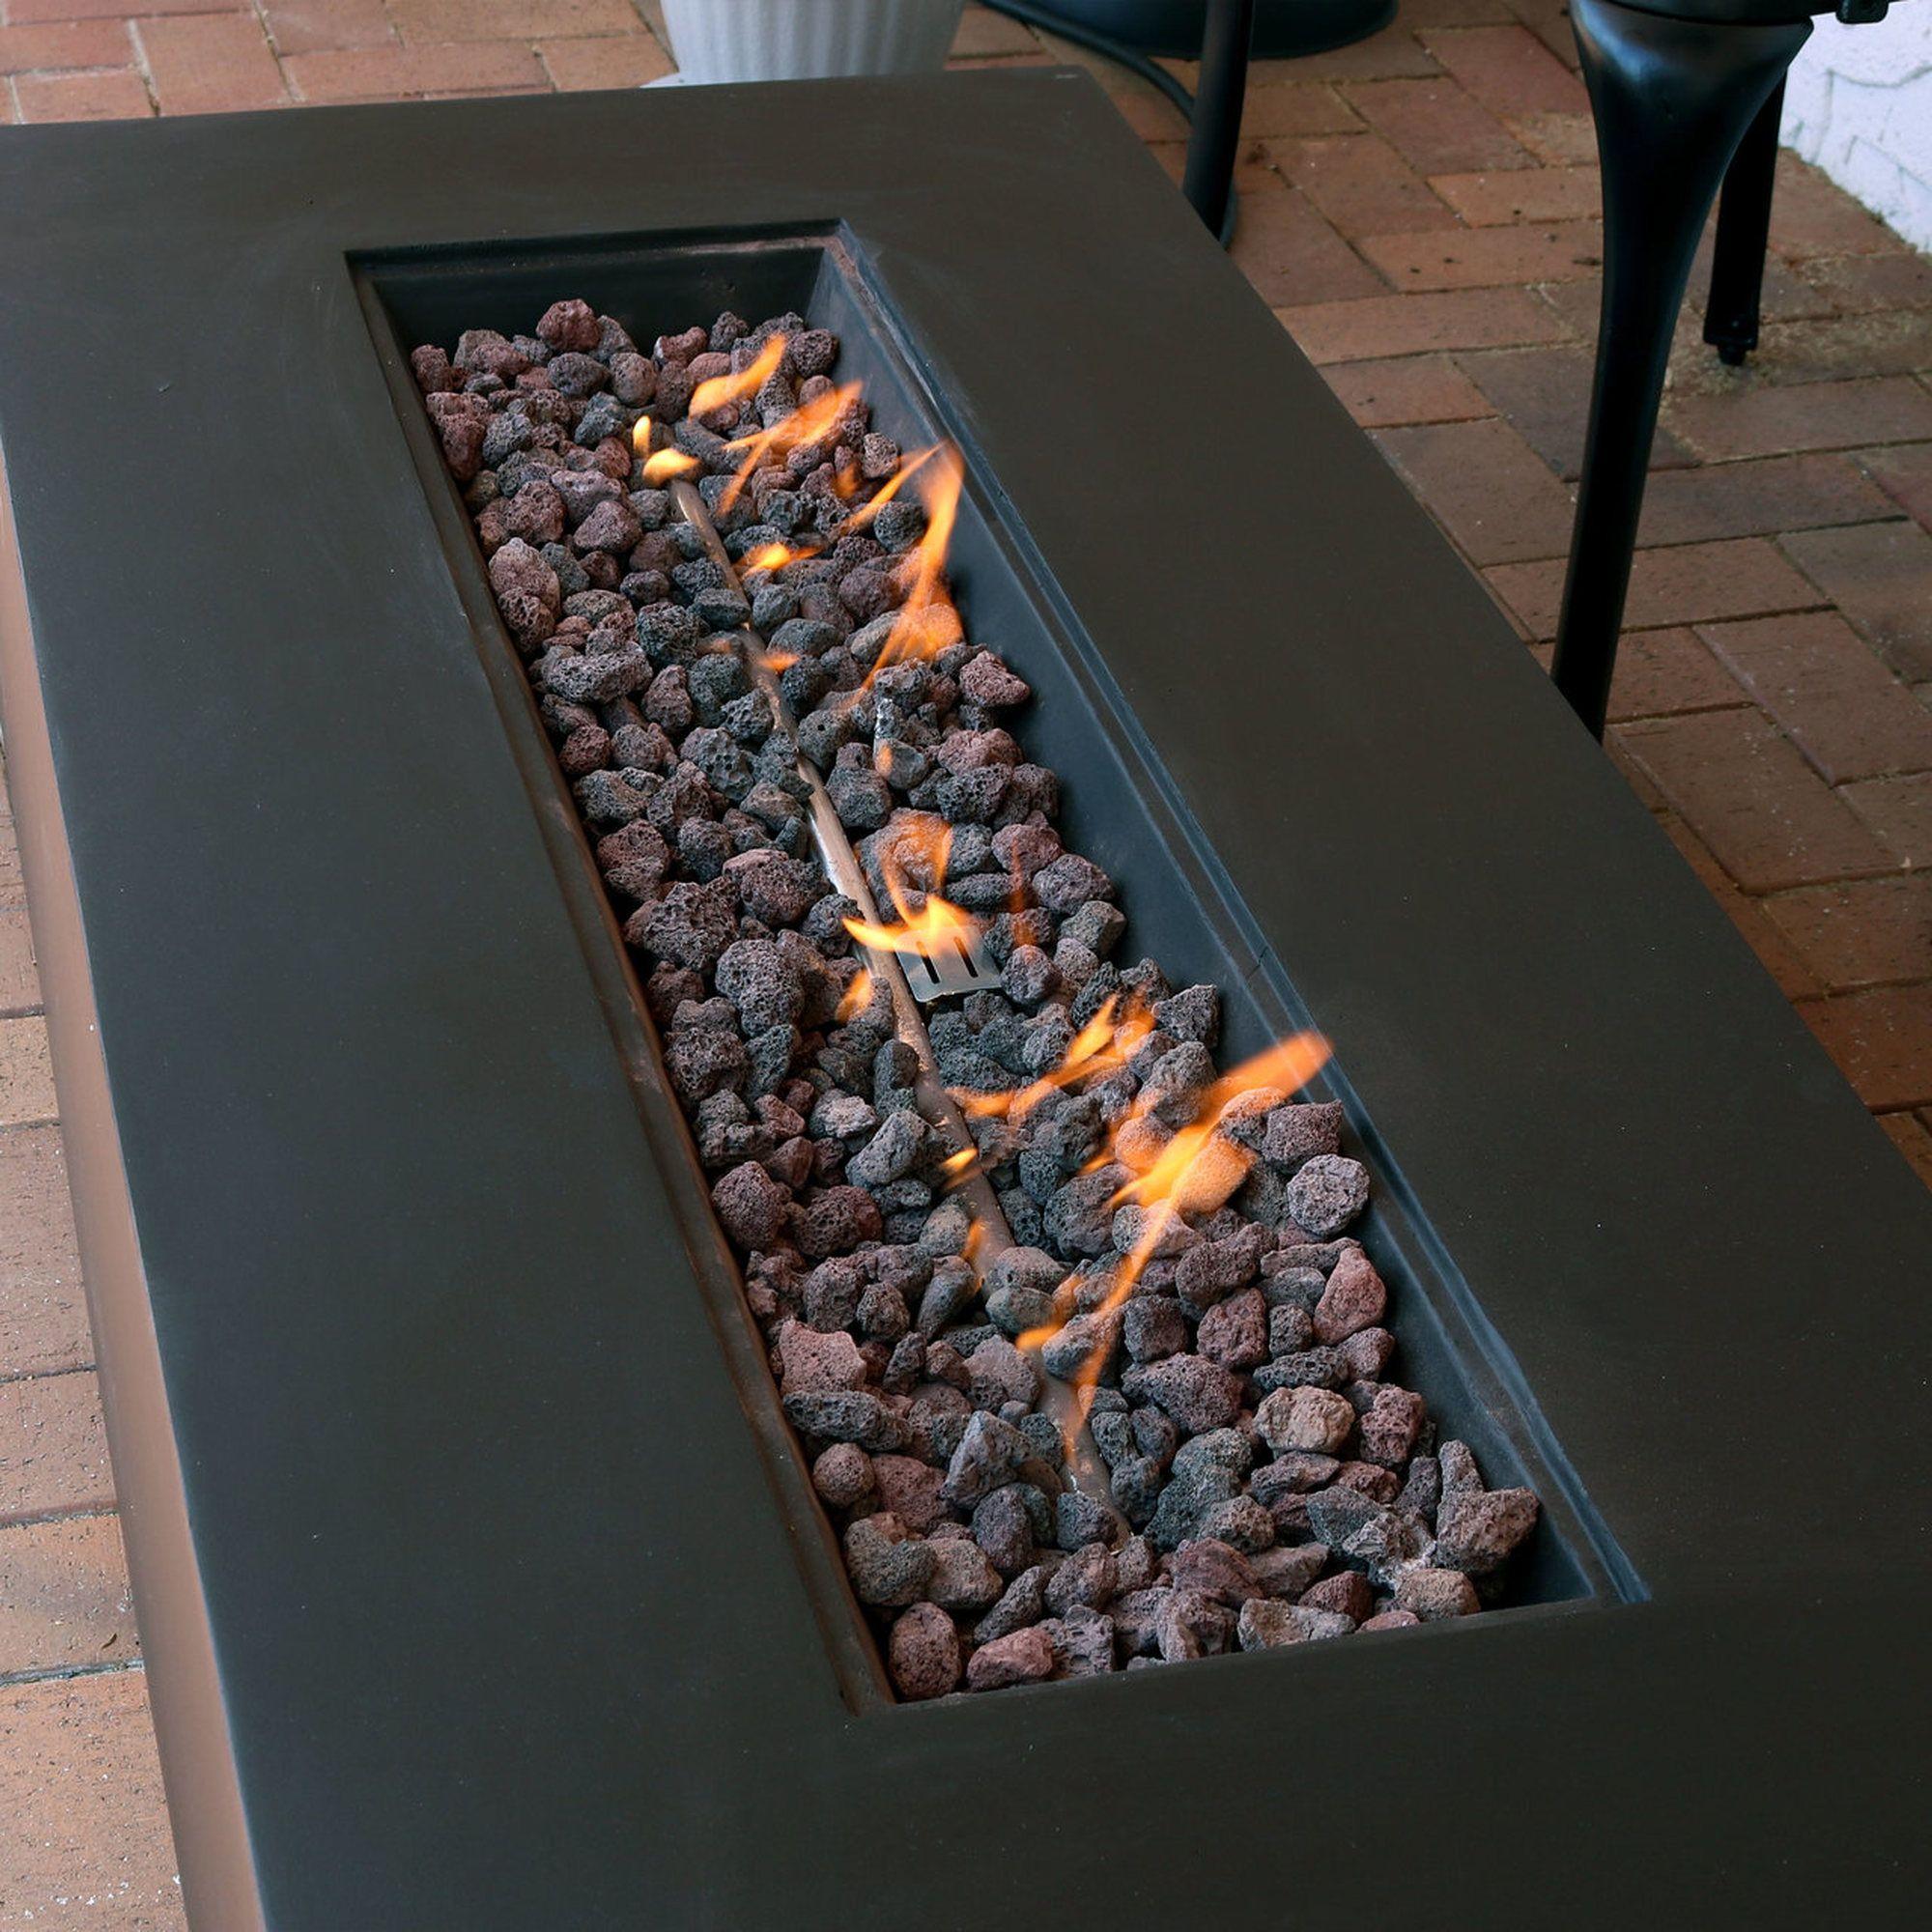 Photo of Sunnydaze 56-Inch Brown Modern Rectangular Liquid Propane Gas Fire Pit Coffee Table with Lava Rocks